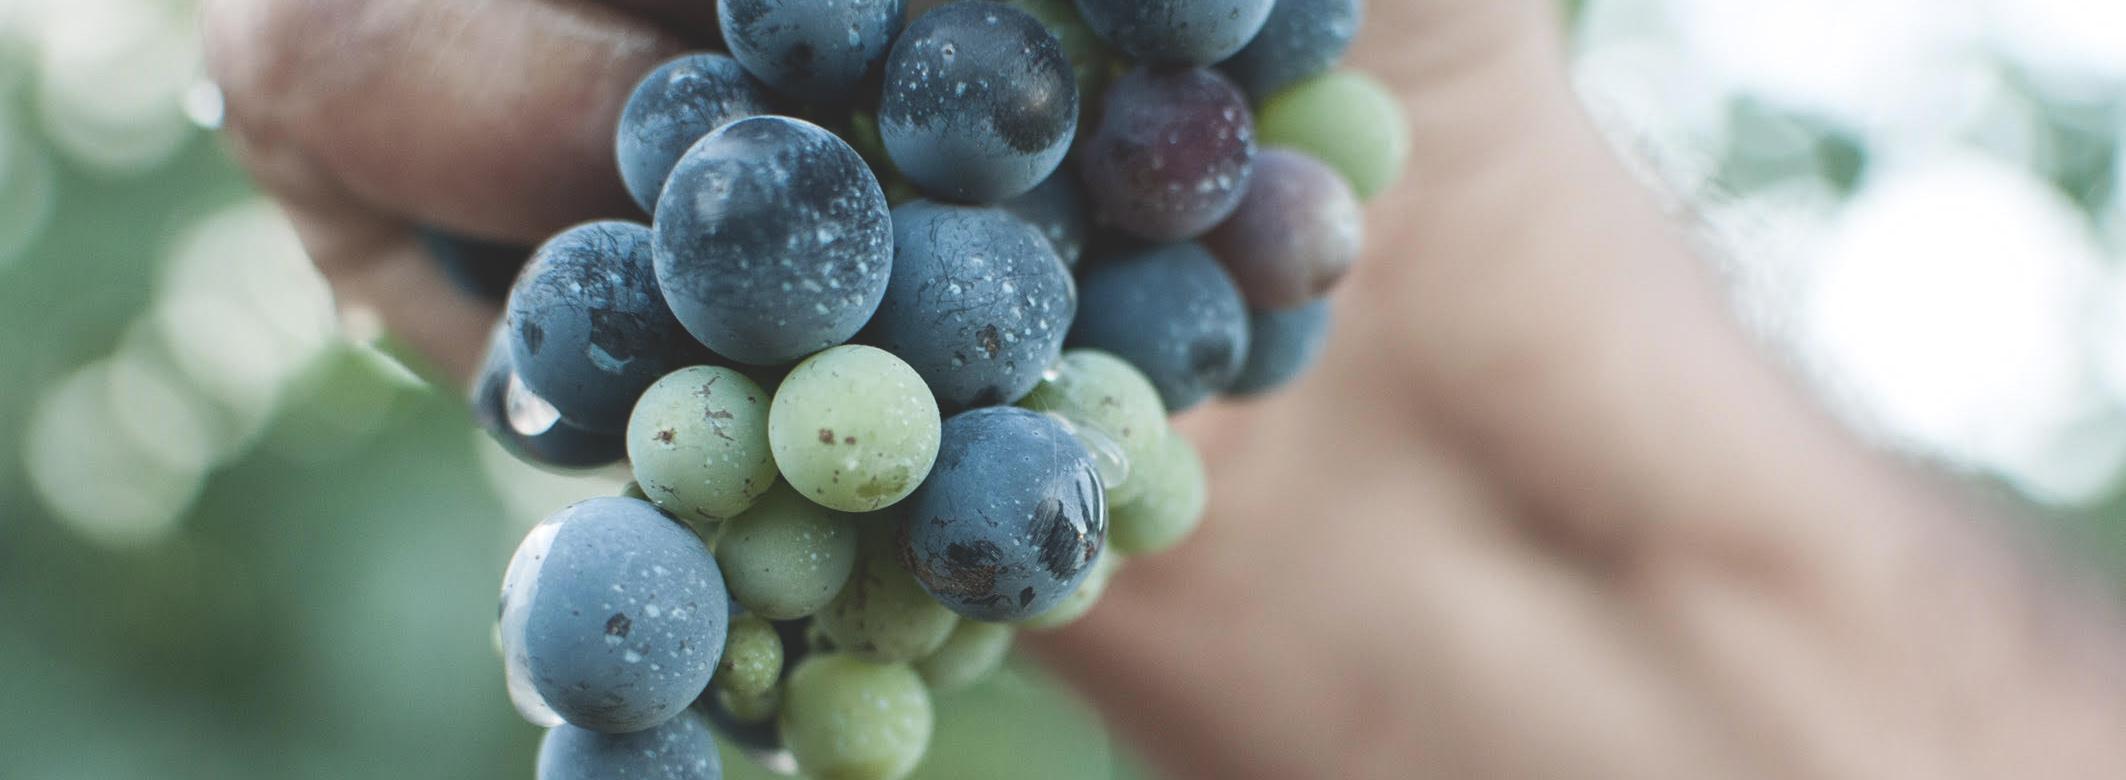 Santo Wines harvest